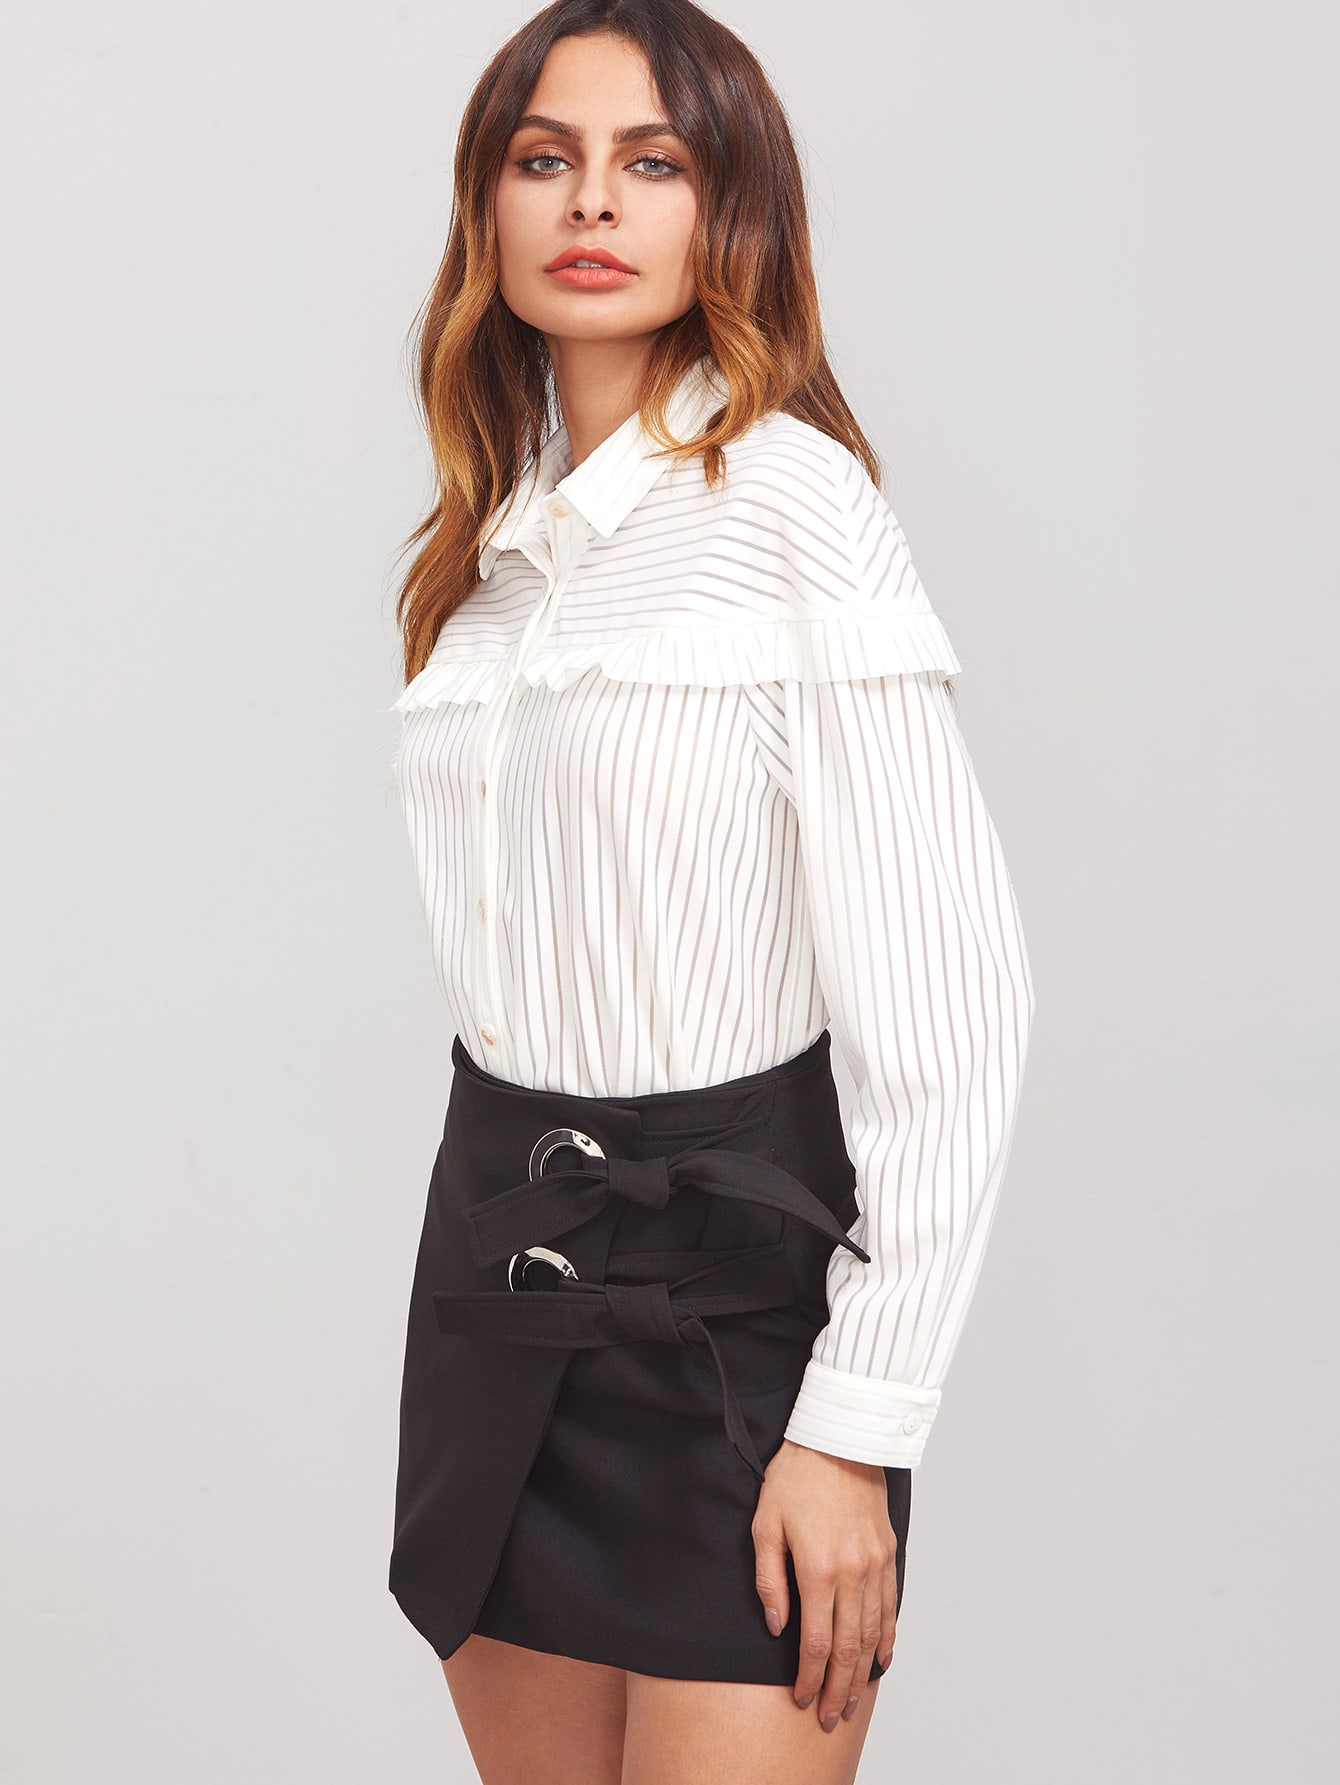 blouse161229707_2